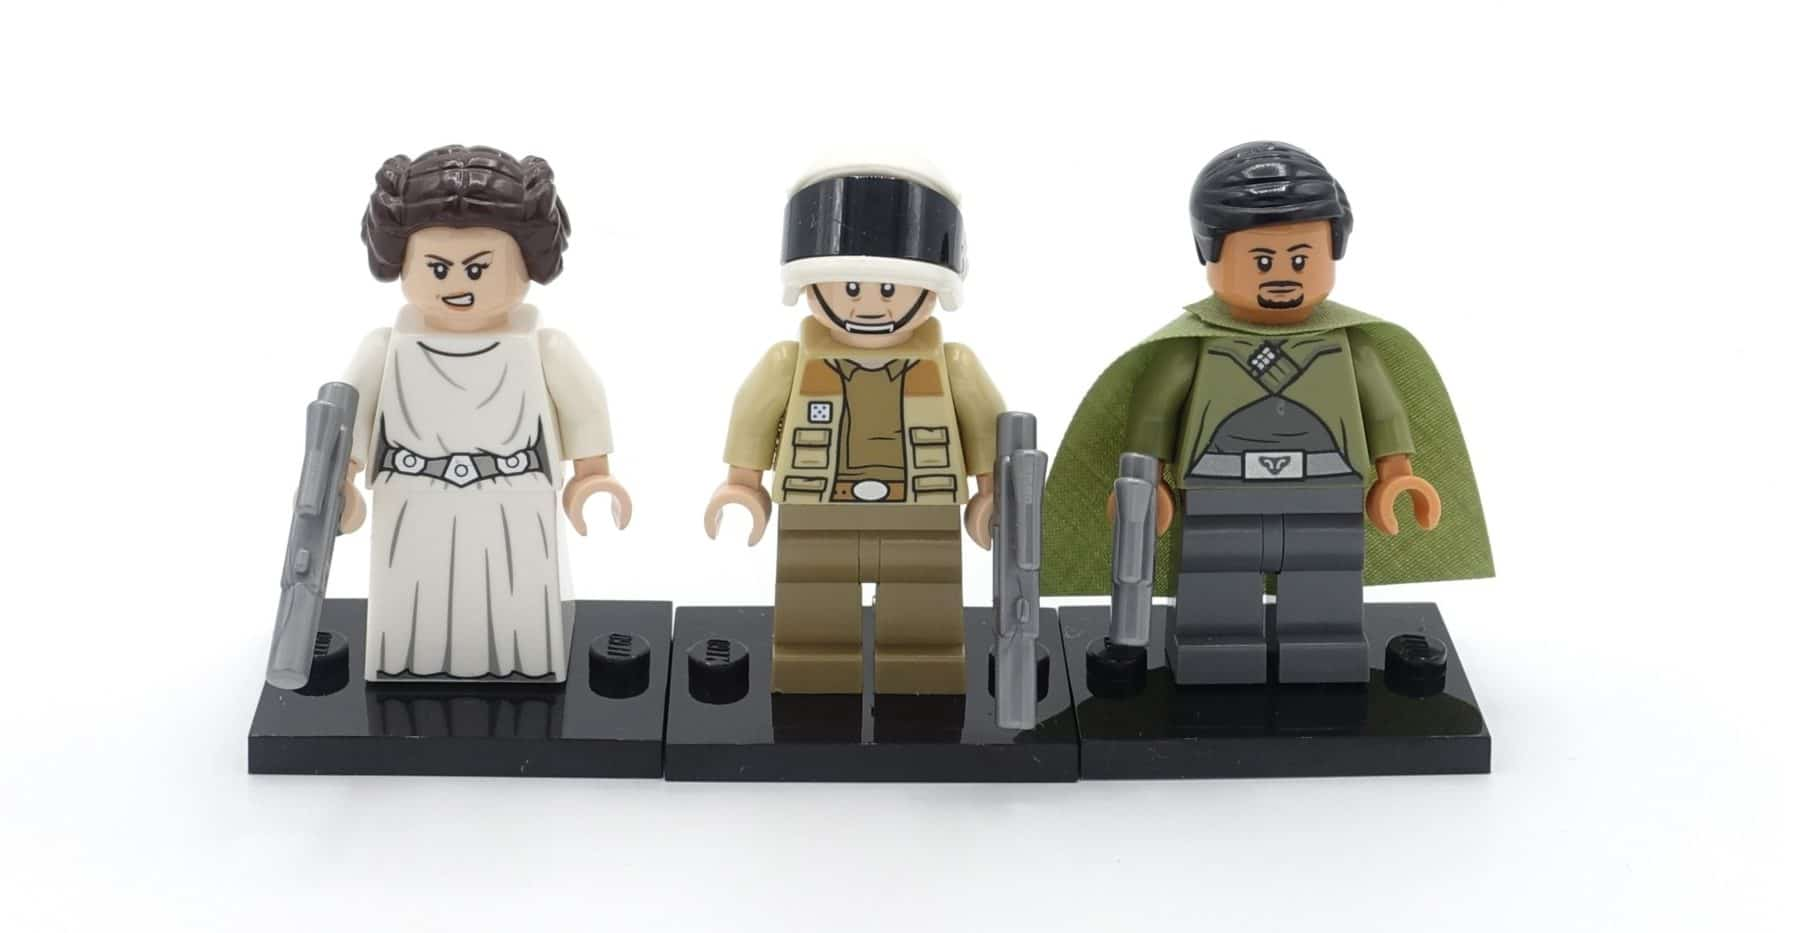 LEGO Star Wars 75244 Tantive IV Minifiguren